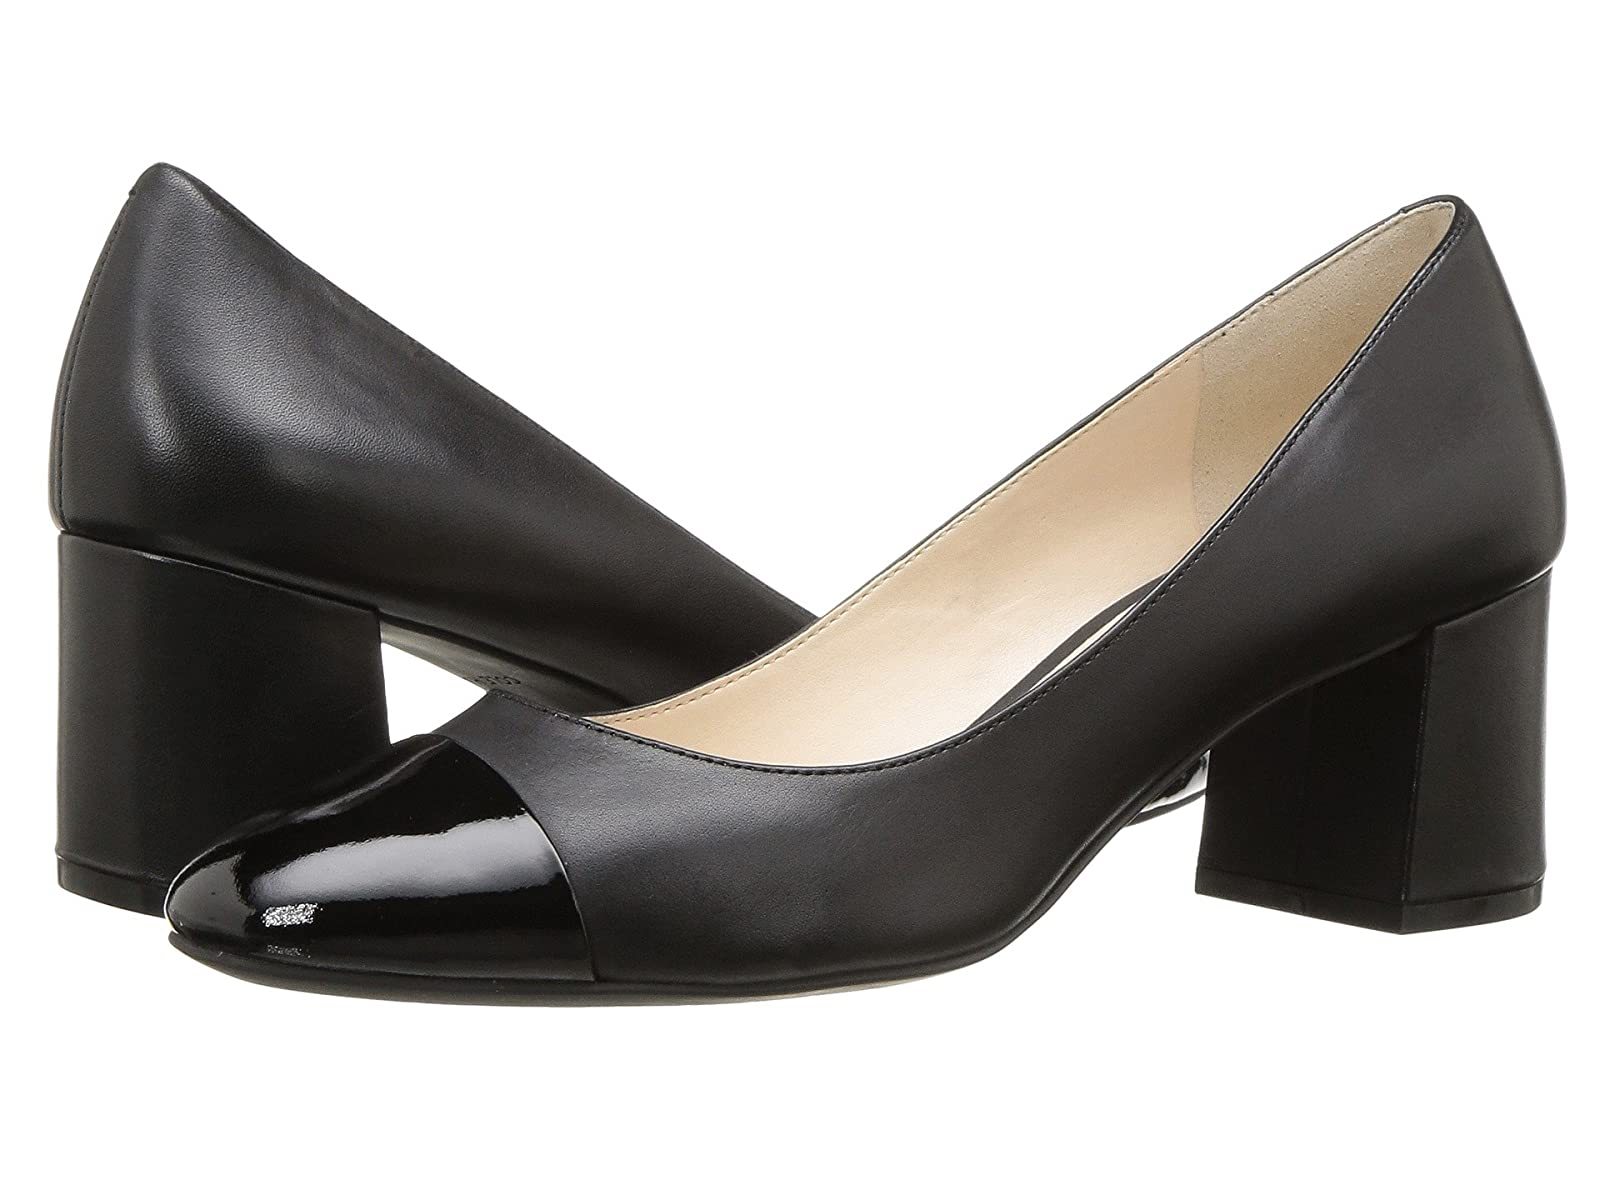 Cole Haan Dawna Grand Pump 55mm IICheap and distinctive eye-catching shoes